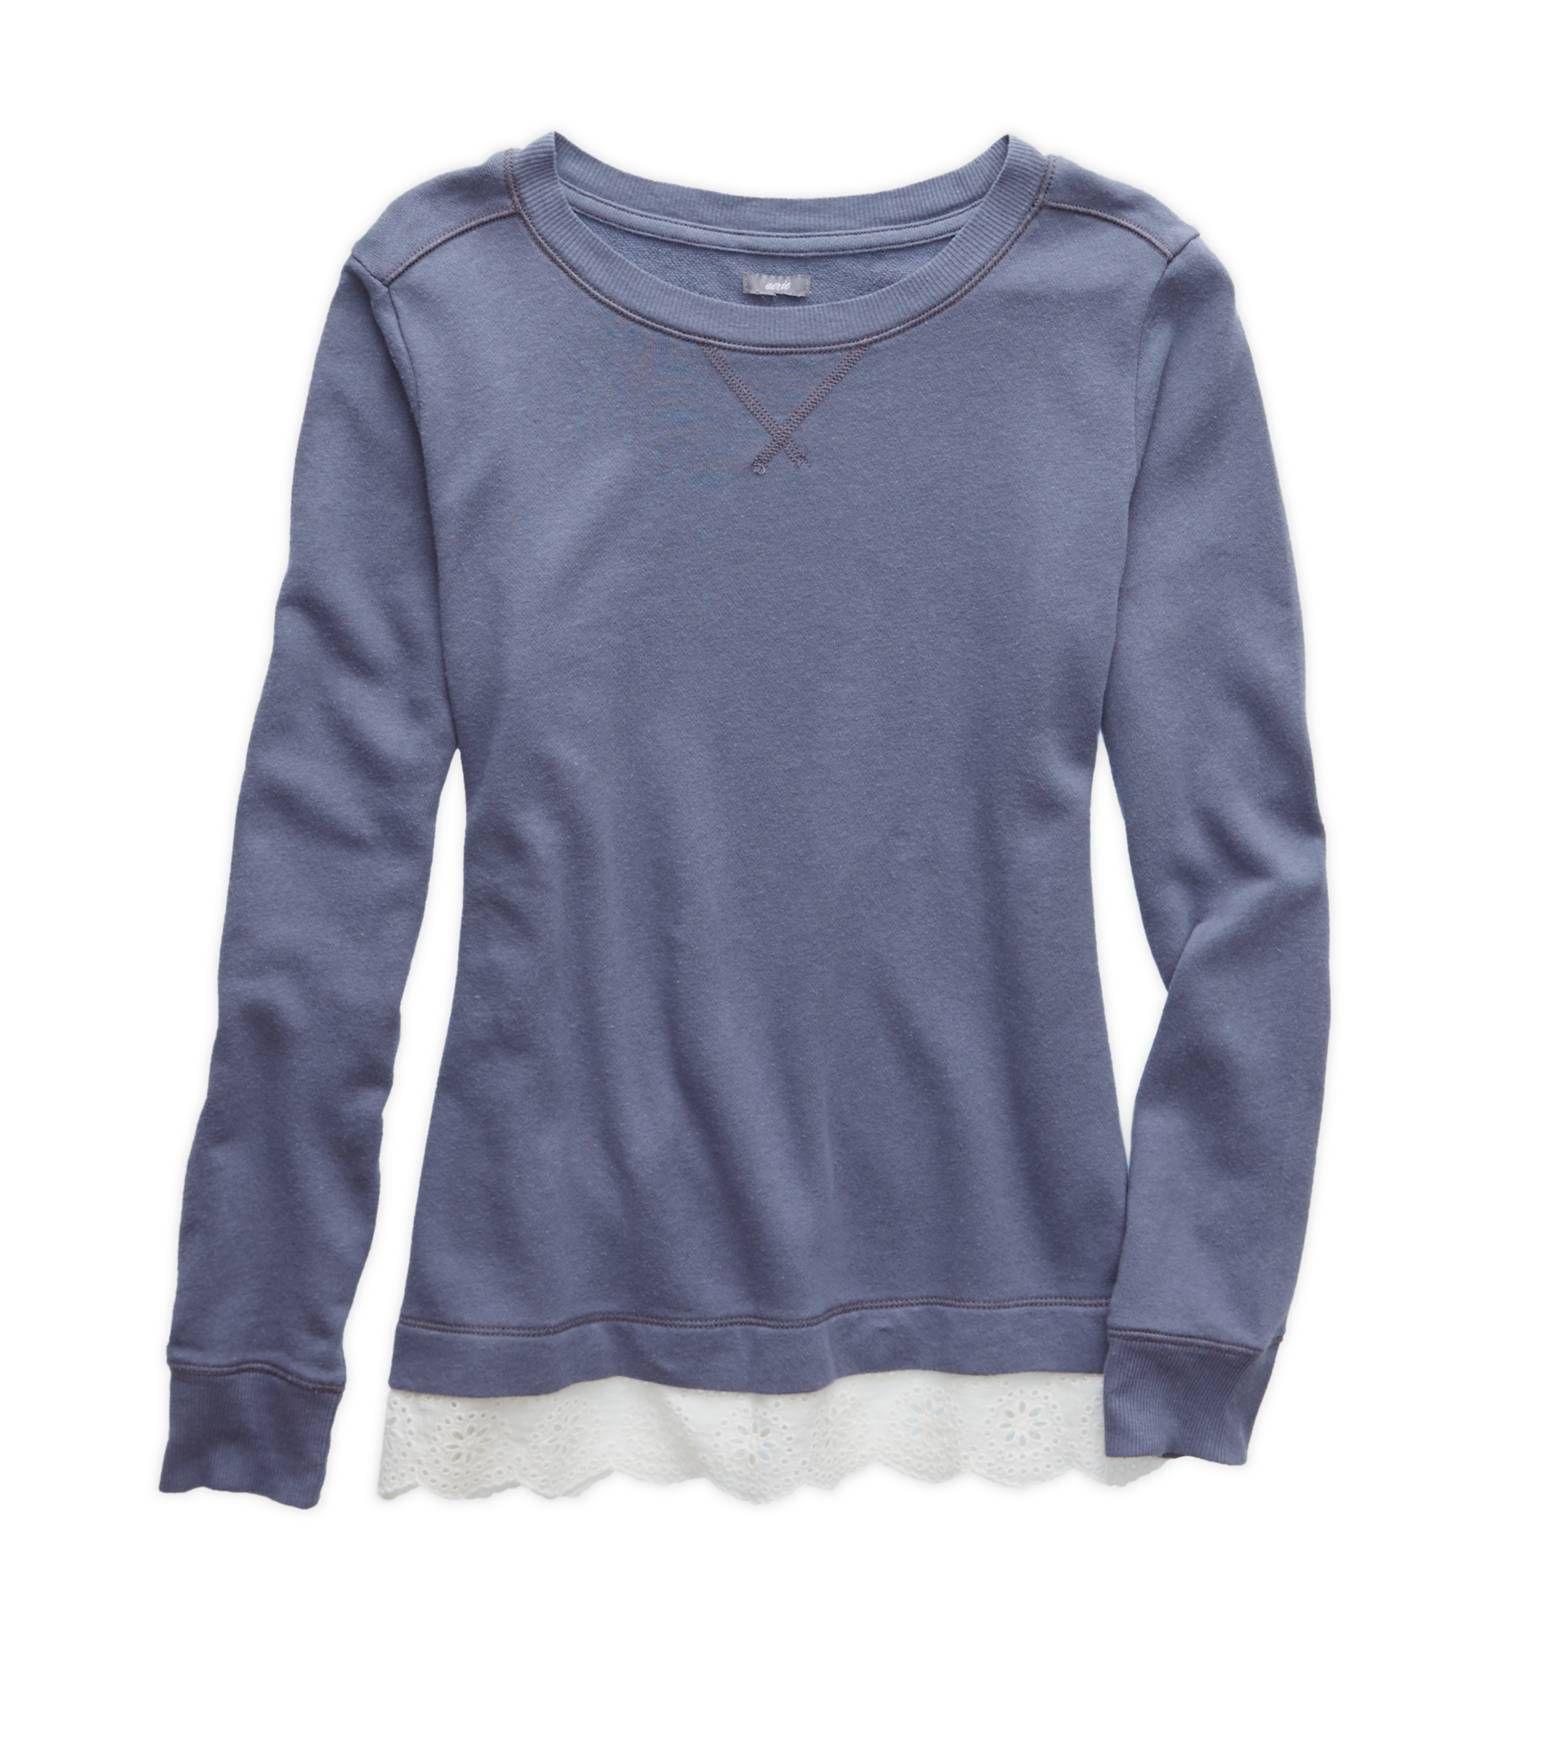 Aerie blue Eyelet Hem Sweatshirt. $34.95